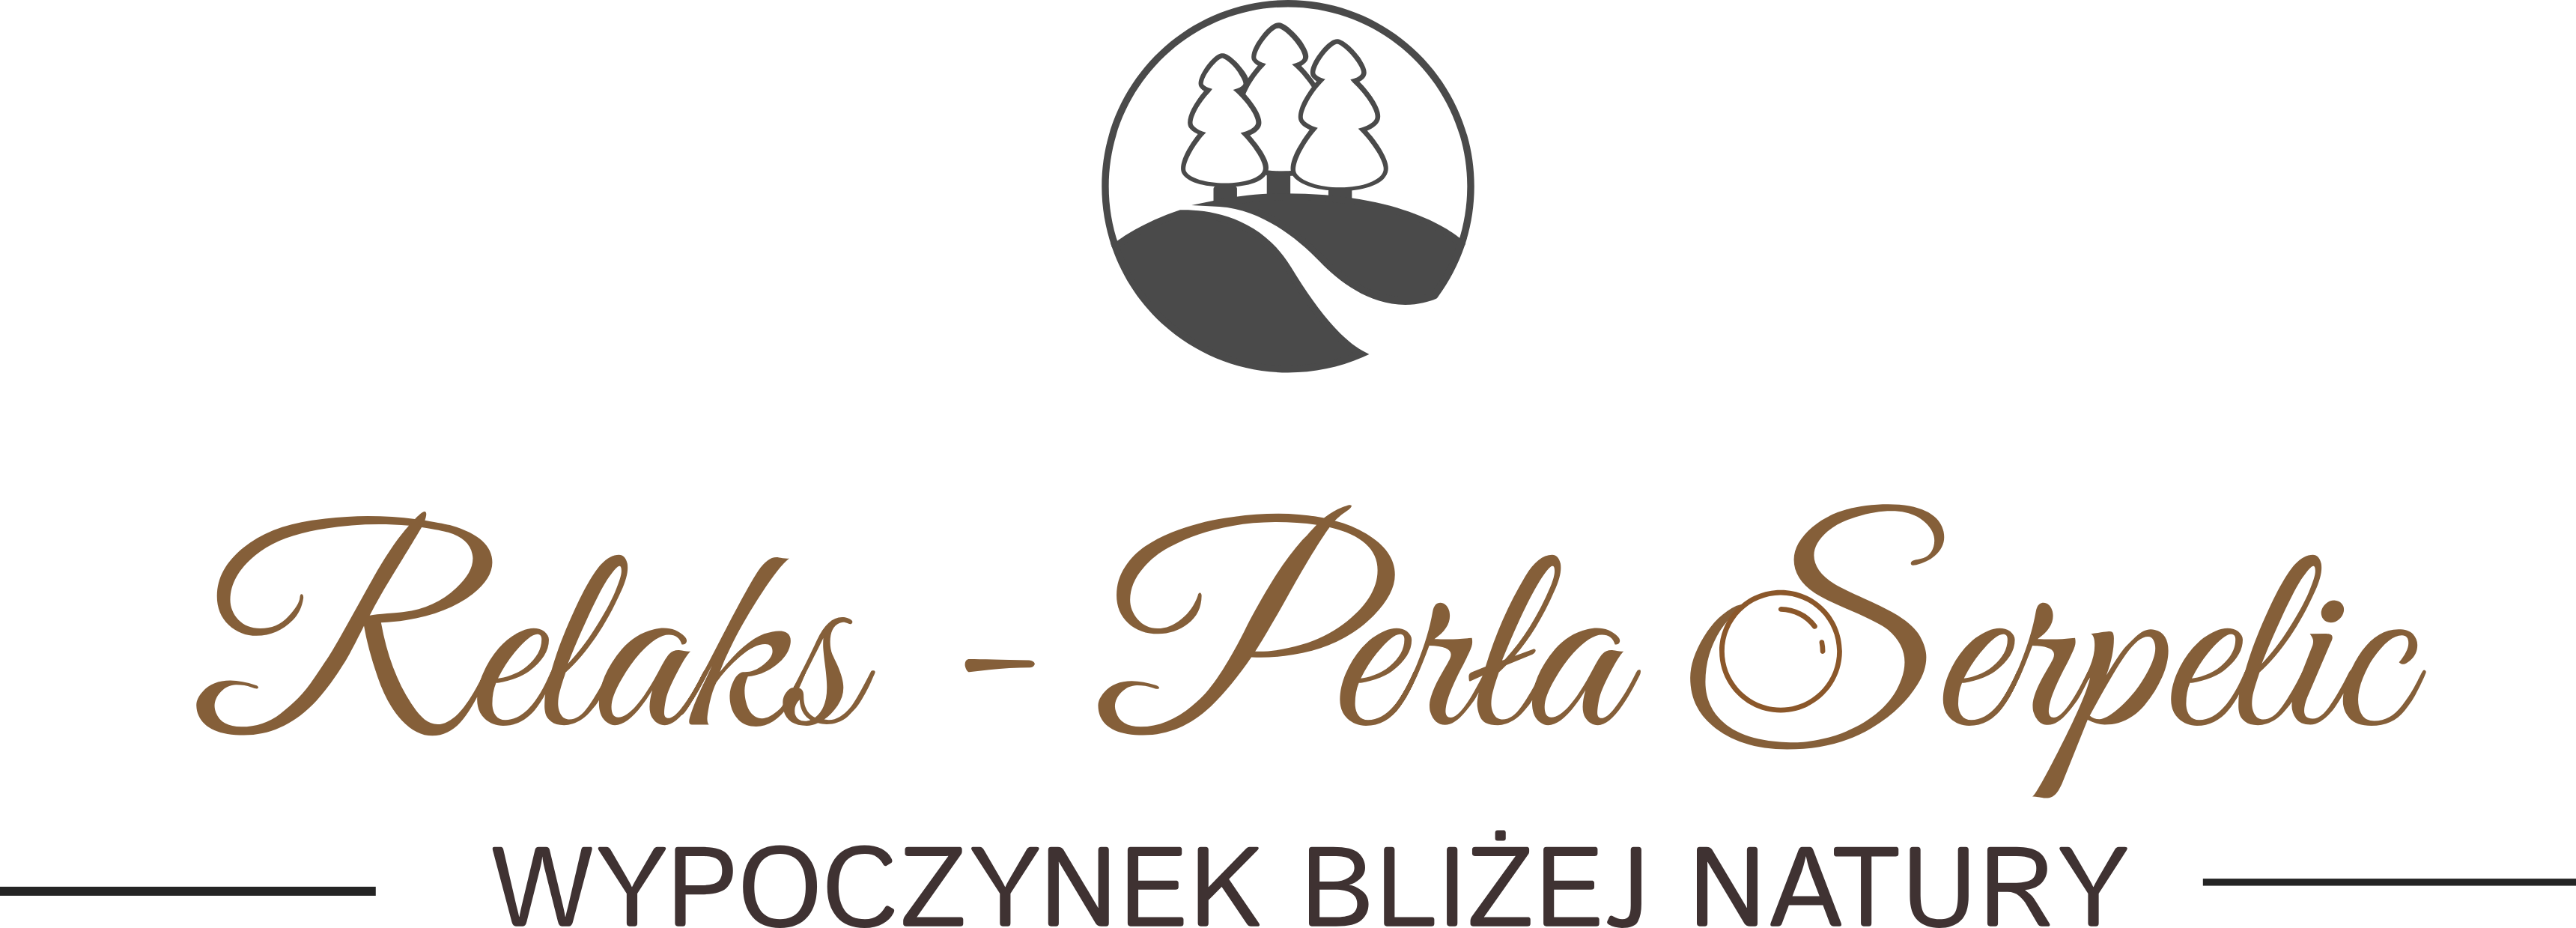 RELAKS - PERŁA SERPELIC